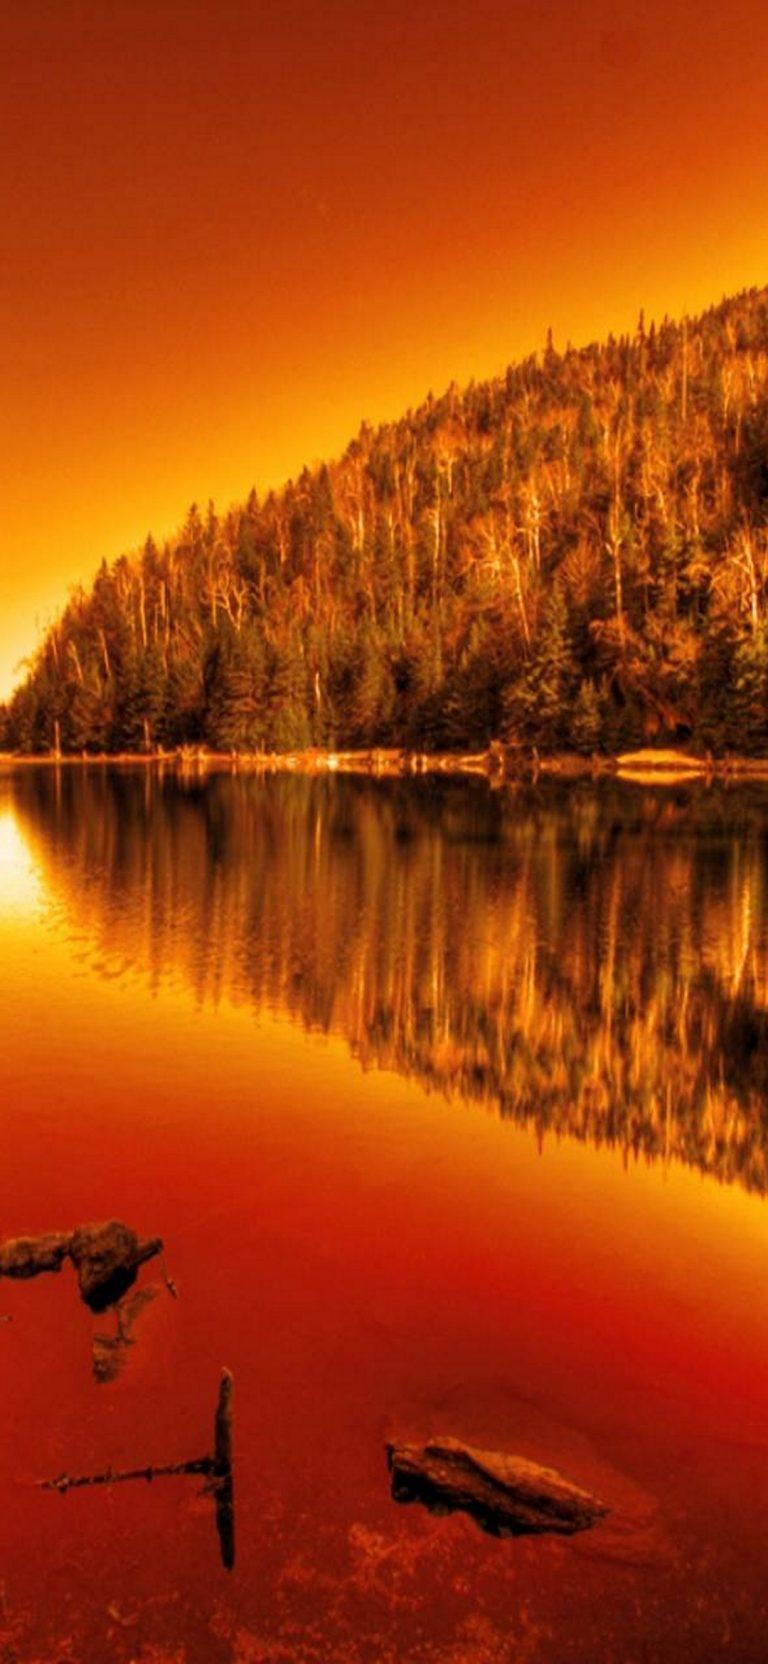 Landscape Phone Wallpaper 023 1080x2340 768x1664